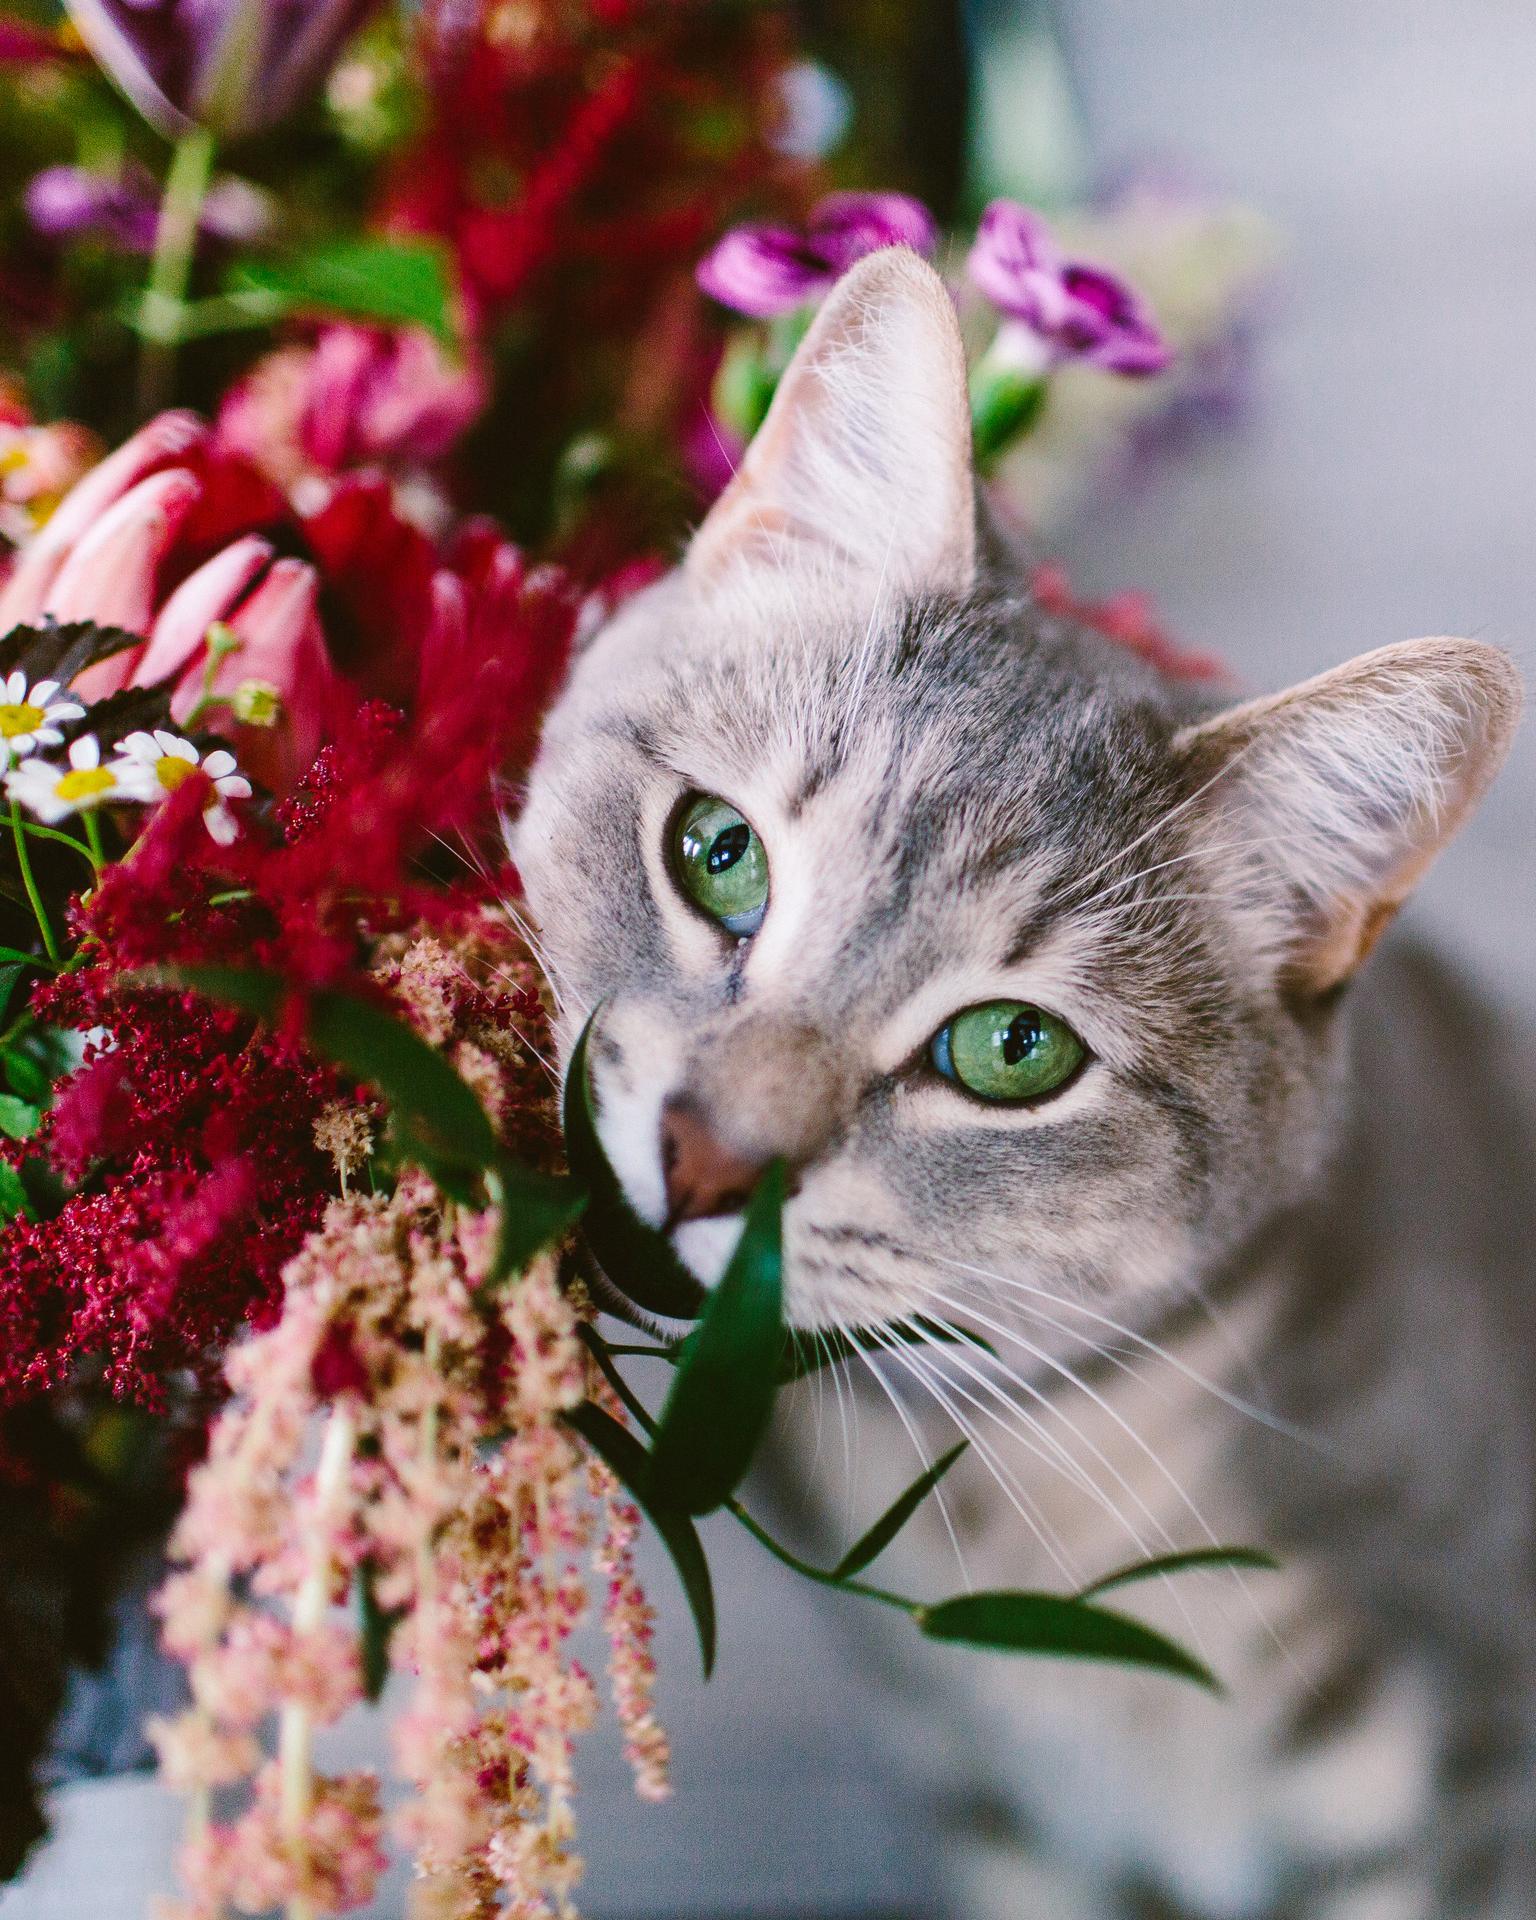 Deb & Meryl's wedding kitty